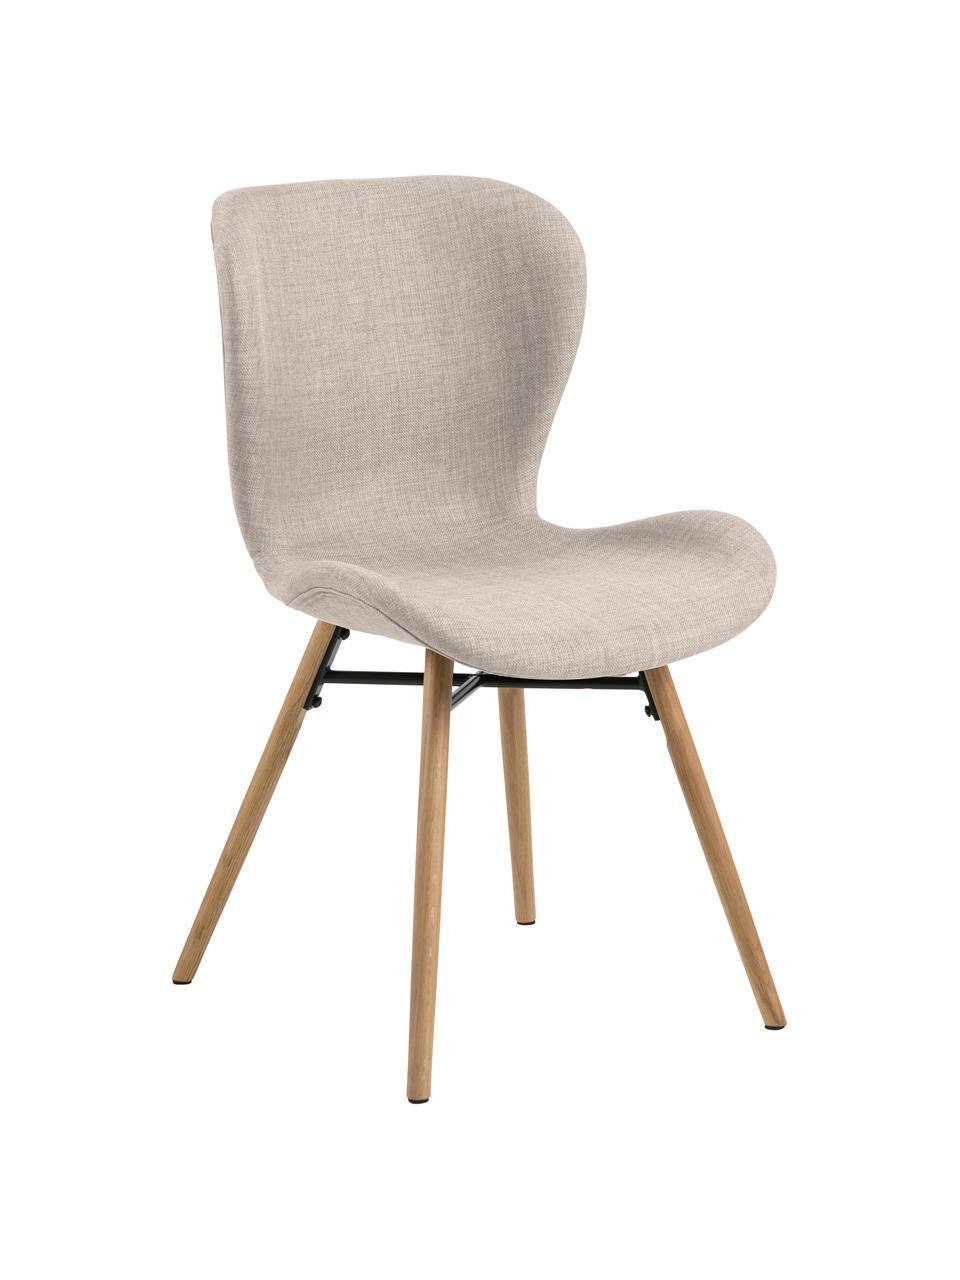 Gestoffeerde stoelen Batilda in zandkleur, 2 stuks, Bekleding: polyester, Poten: Eikenhout, massief, gelak, Geweven stof zandkleurig, eikenhout, B 47 x D 53 cm